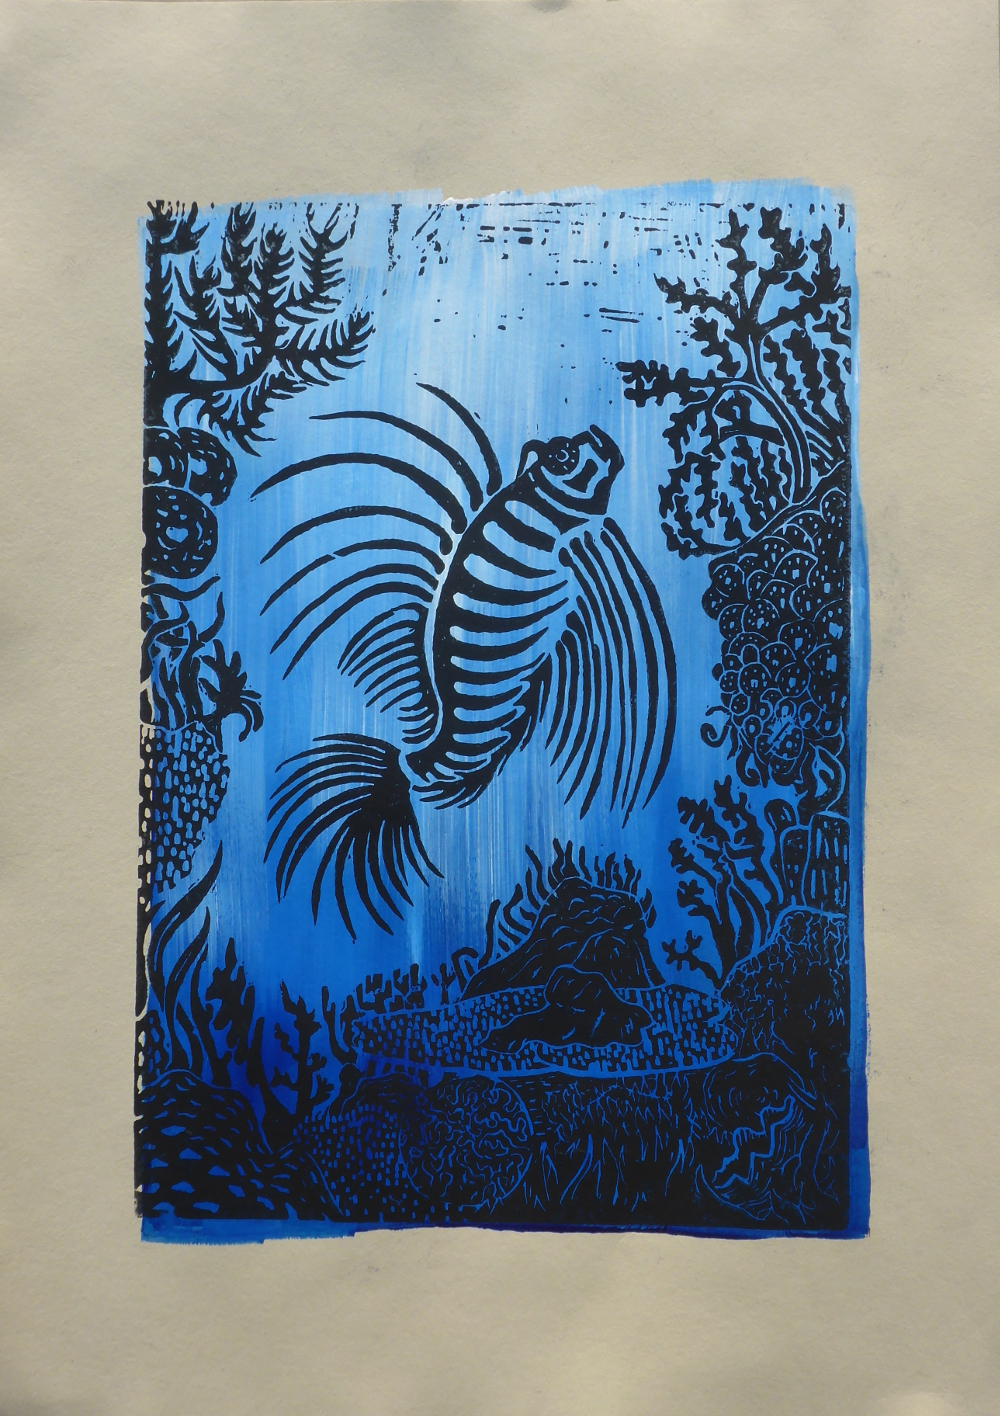 """The reef III"", 2019, linocut and acrylic on paper, 30 x 42 cm"